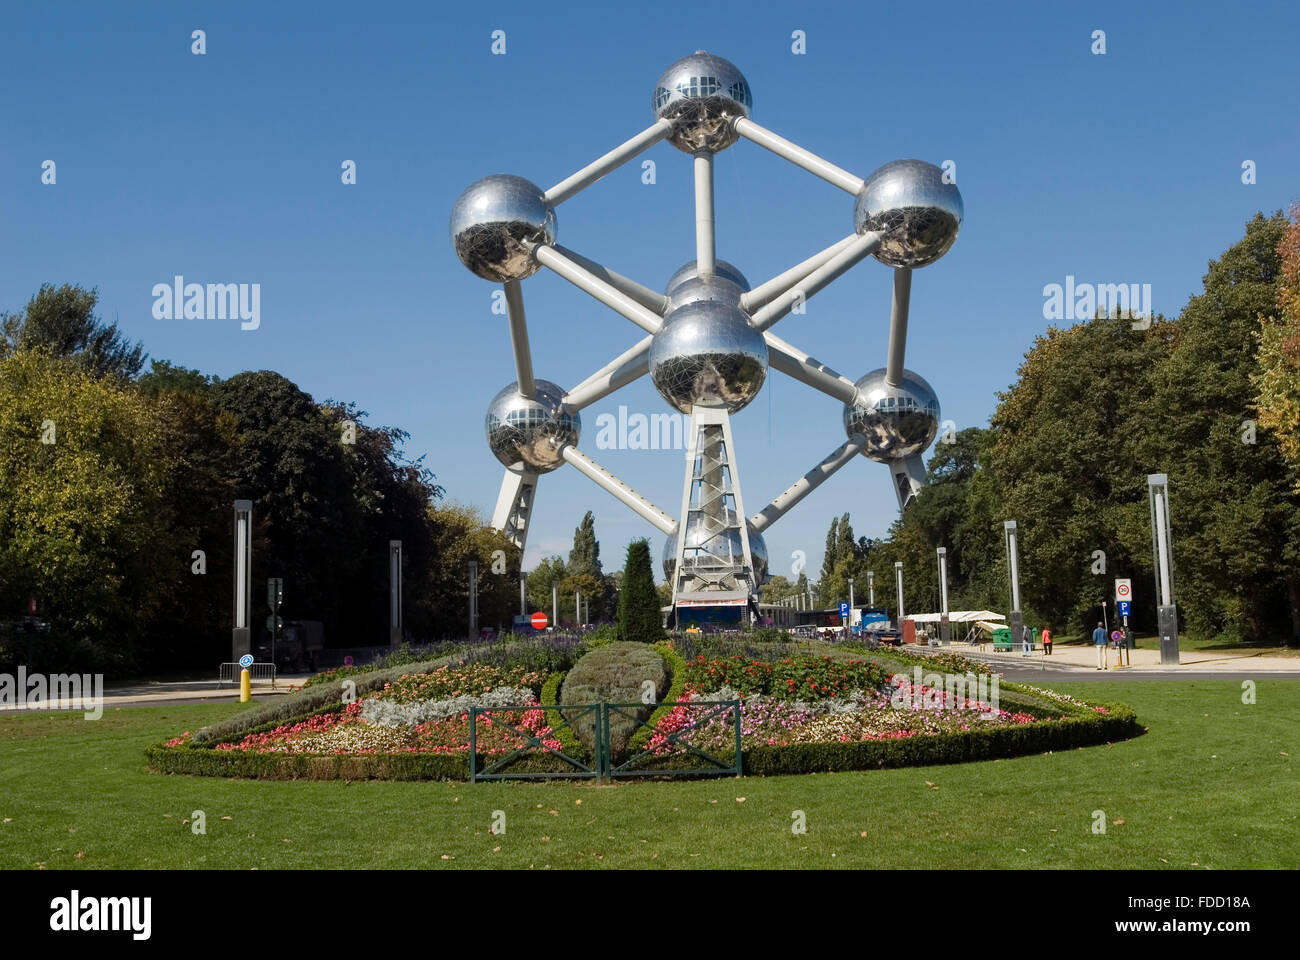 Atomium Worldfamous Monument of an iron atomic nucleus Brussels Belgium Europe - Stock Image